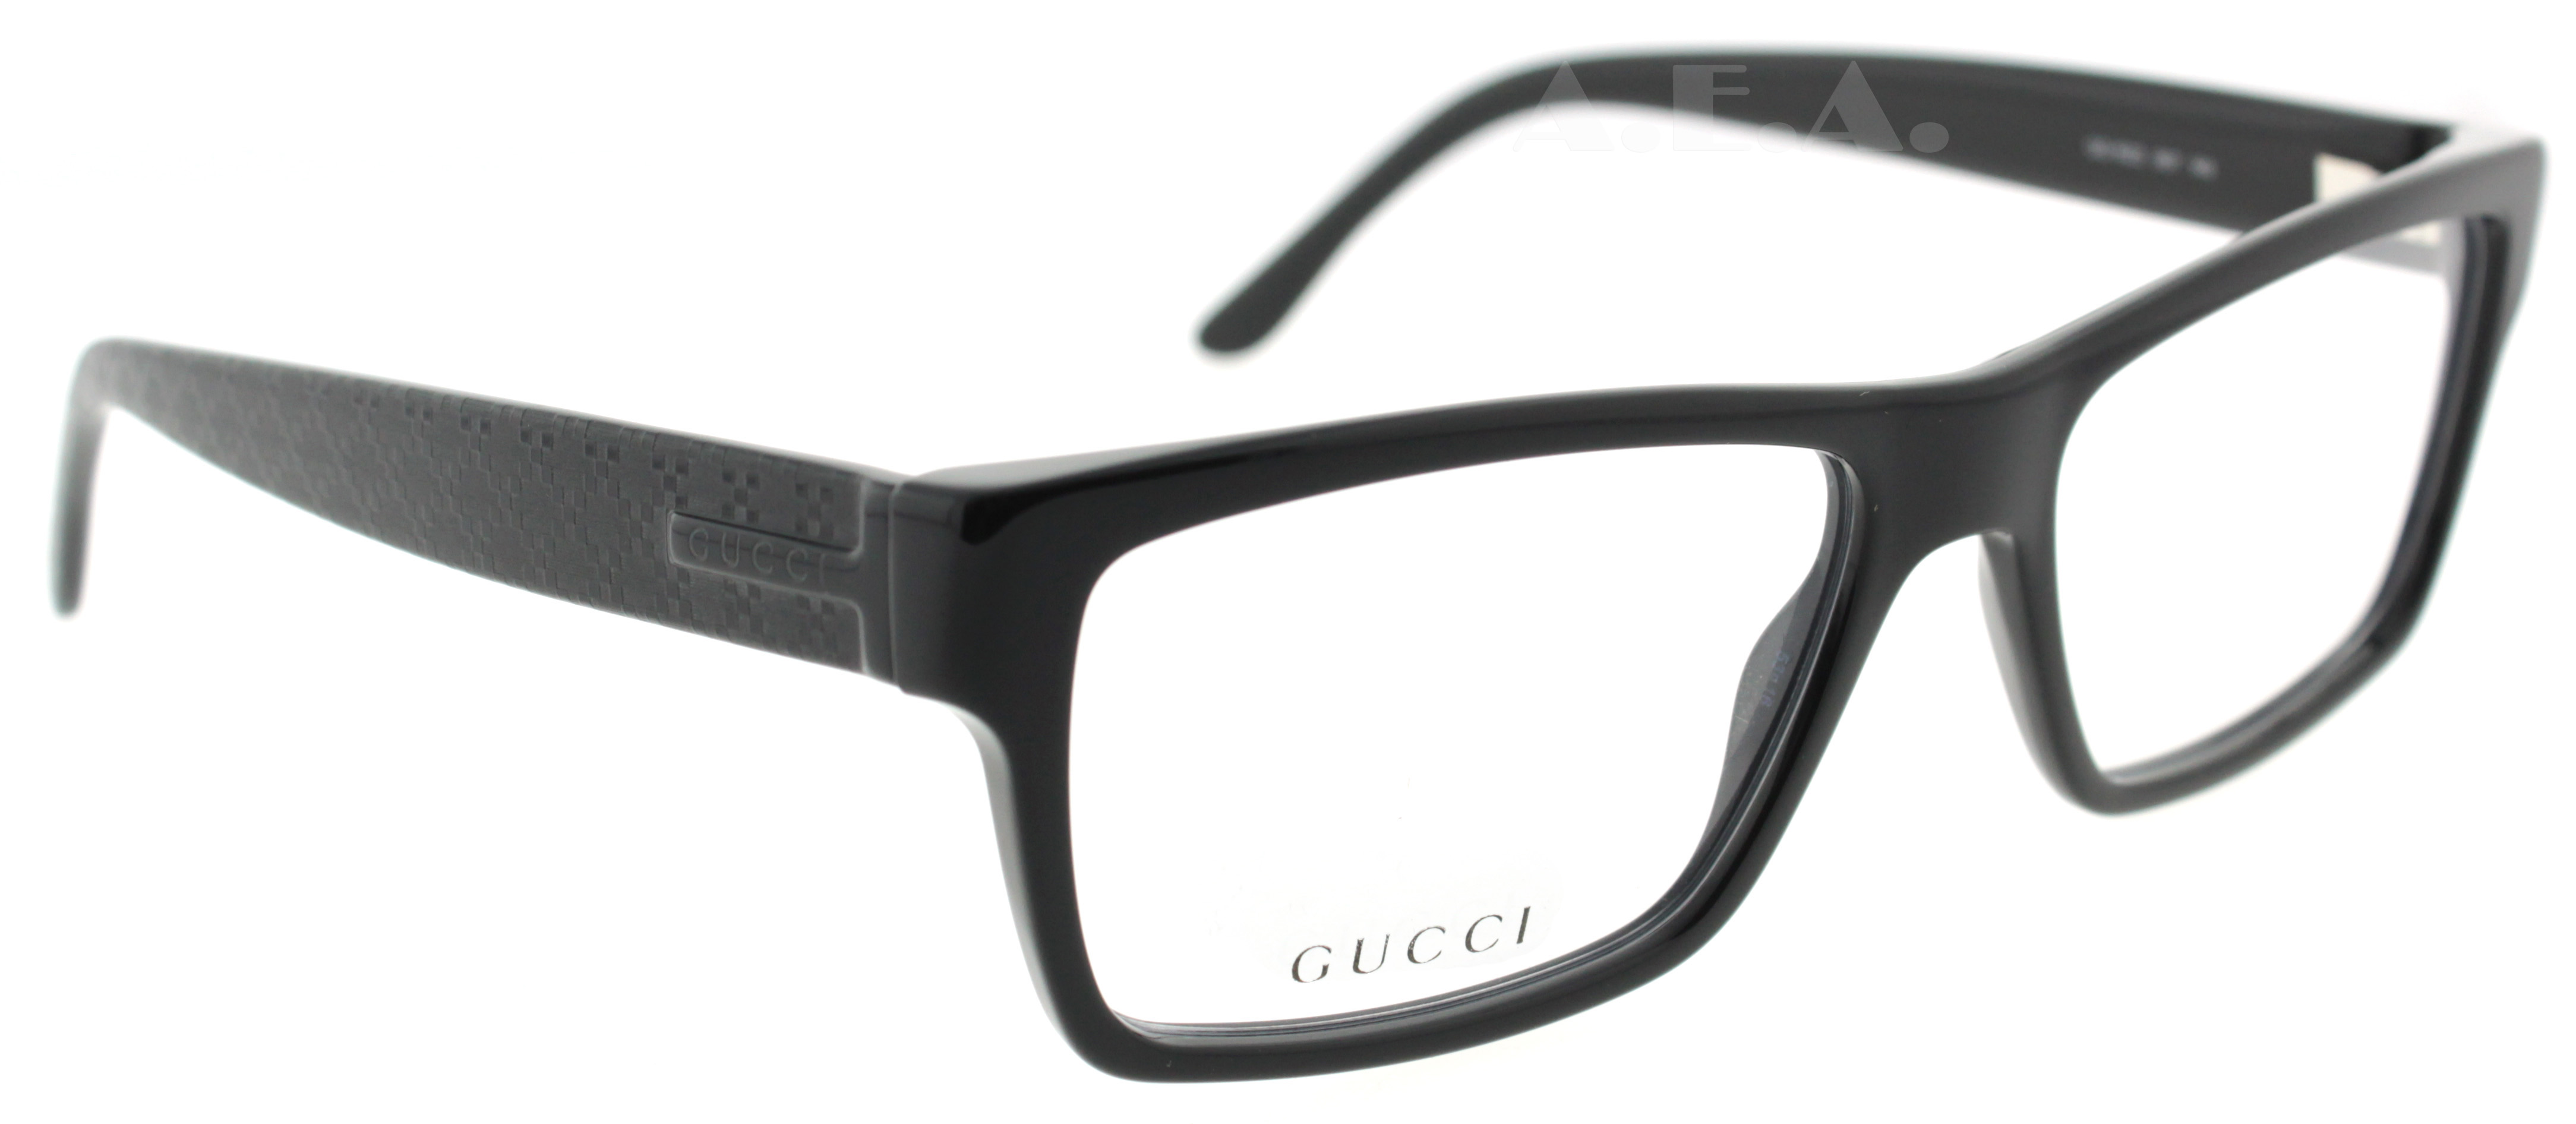 Gucci Eyeglass Frames Mens : GUCCI GG 1022 BLACK 807 GG1022 MENS DESIGNER EYEGLASSES ...